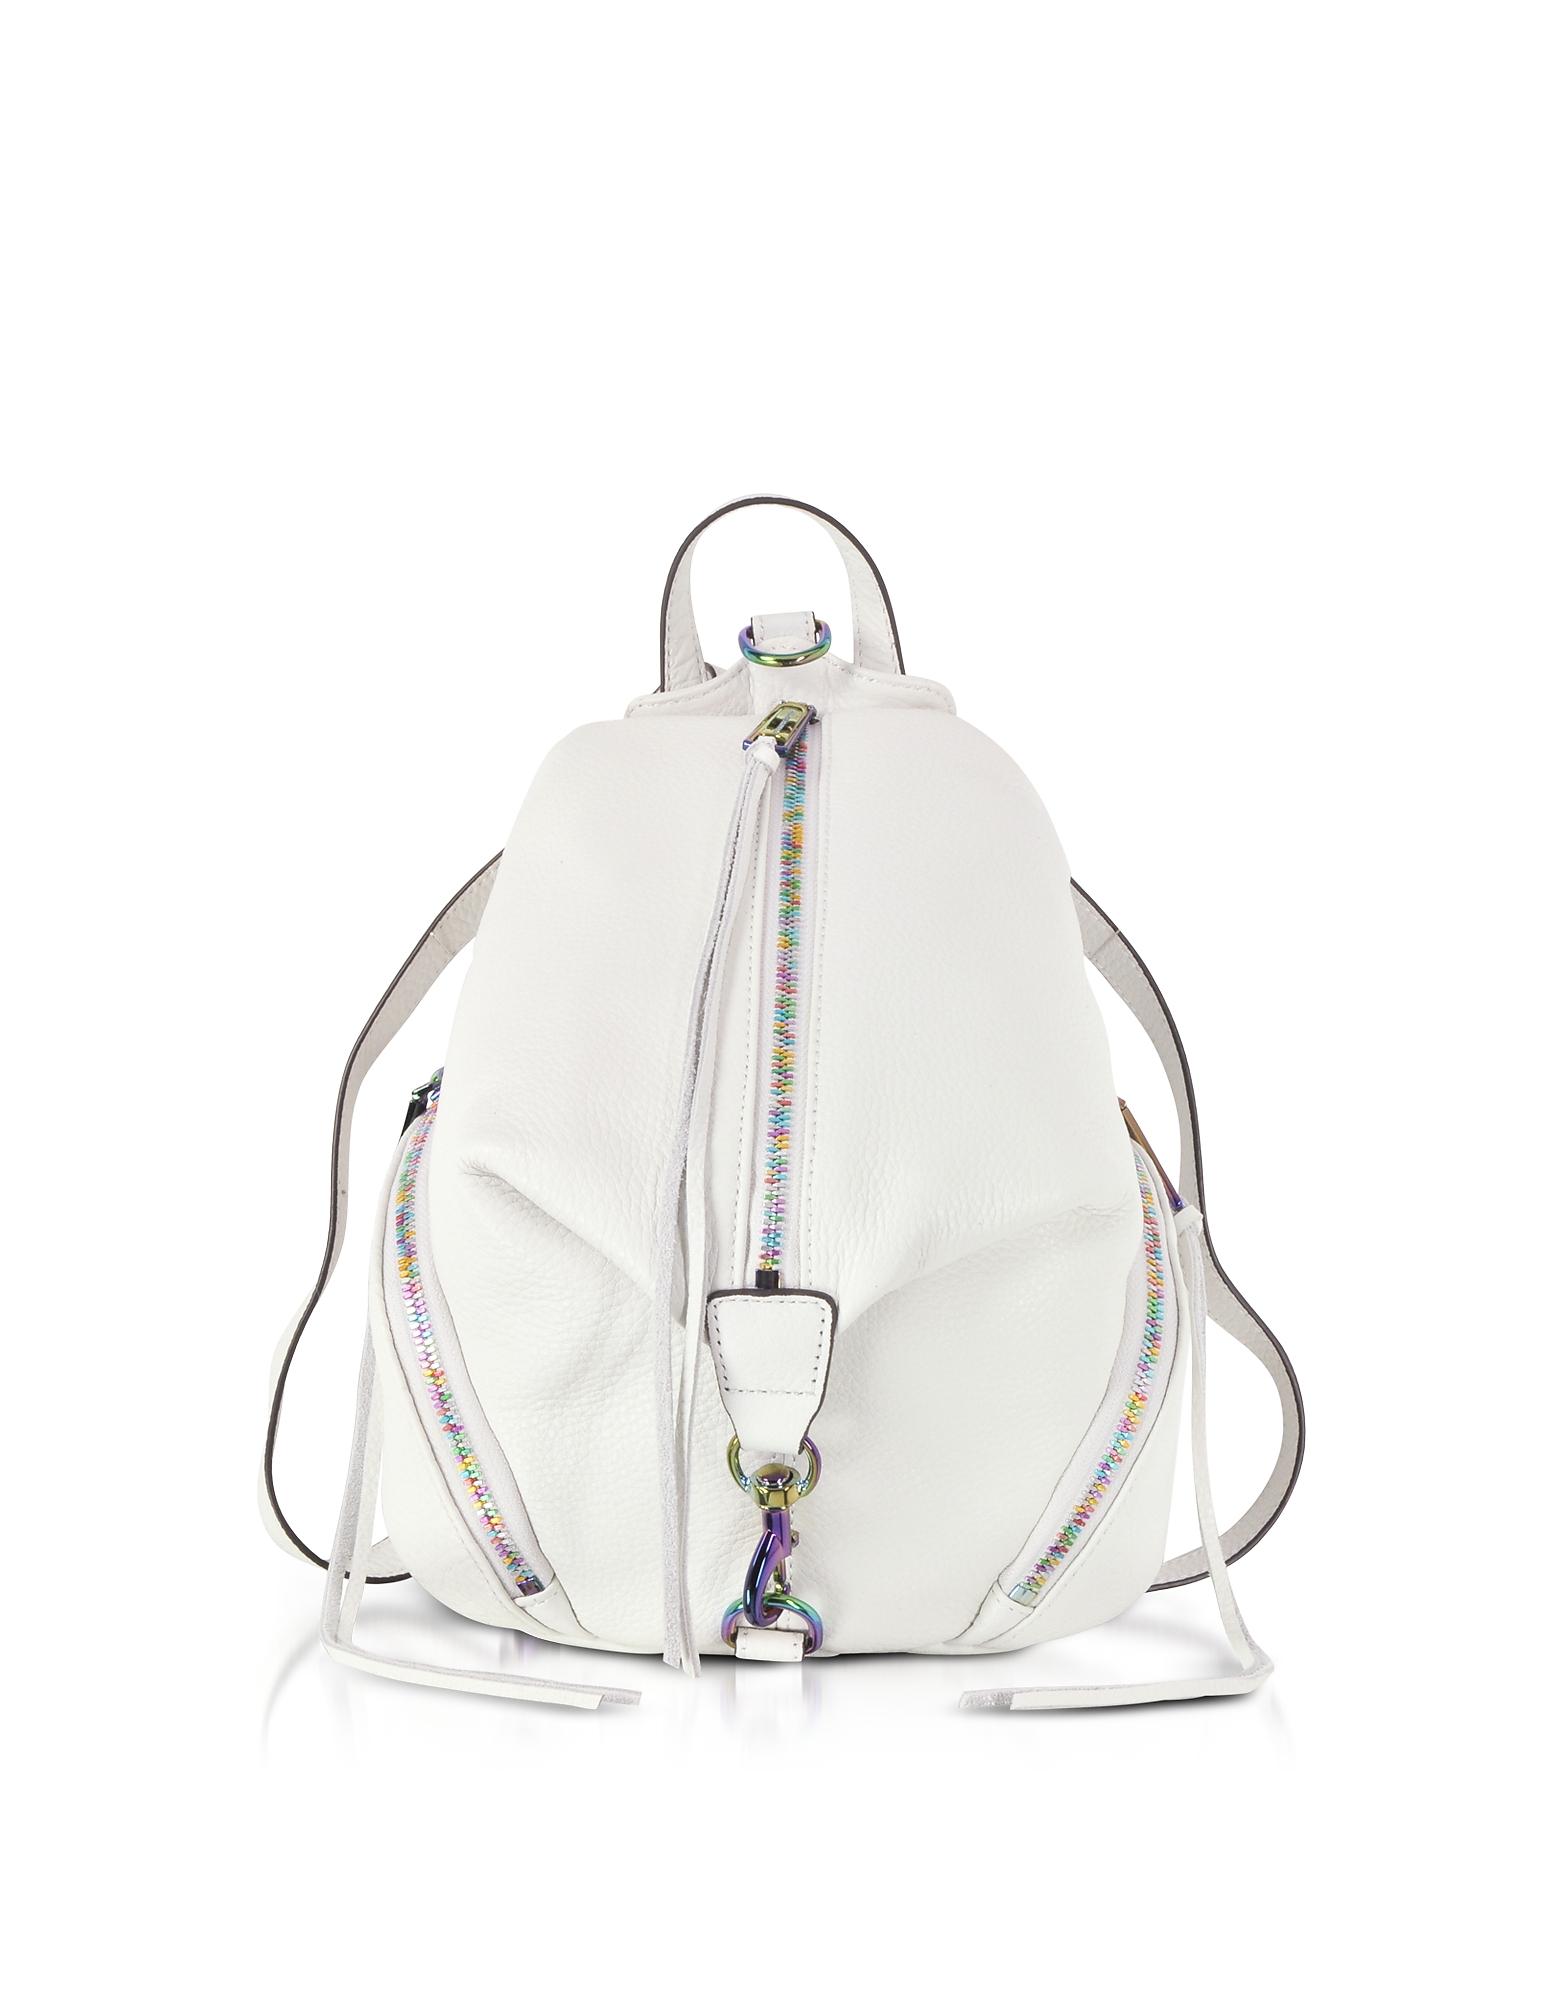 Rebecca Minkoff Handbags, Bianco Leather Medium Julian Backpack